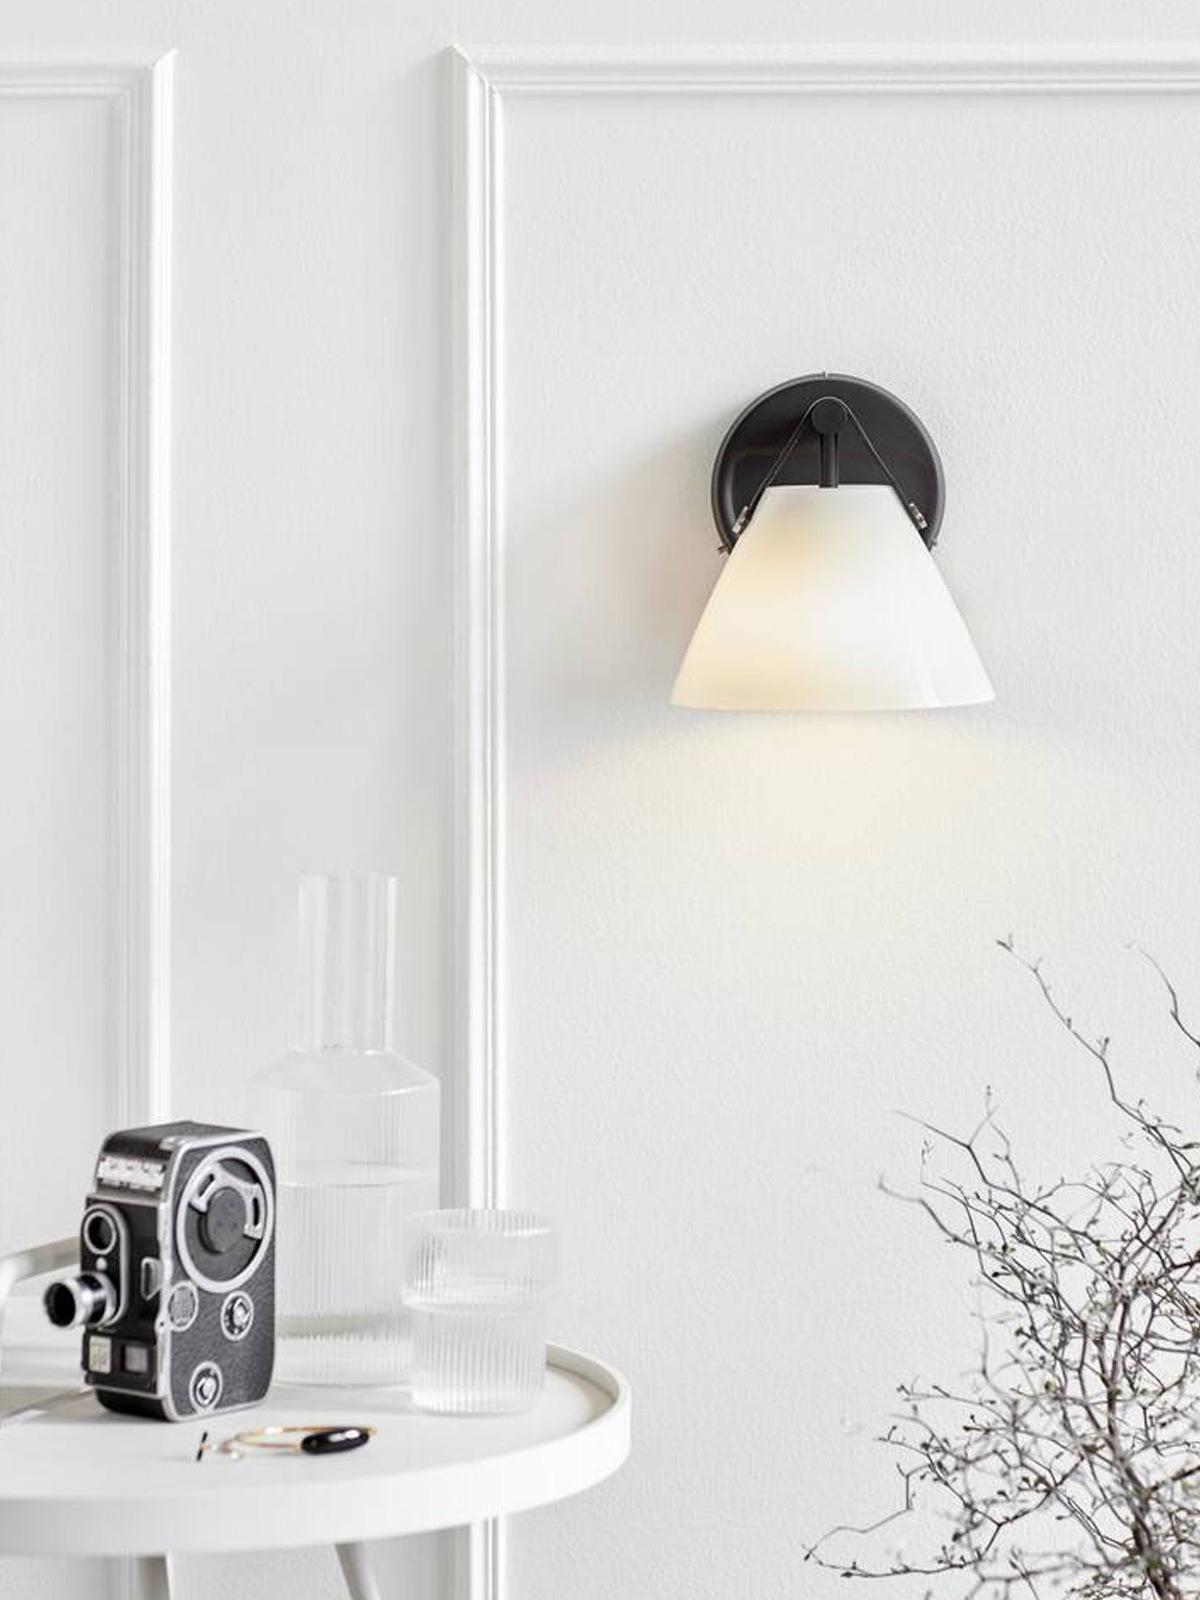 DesignOrt Lmapenblog: Wandlampe in Opalglas Design vor the People